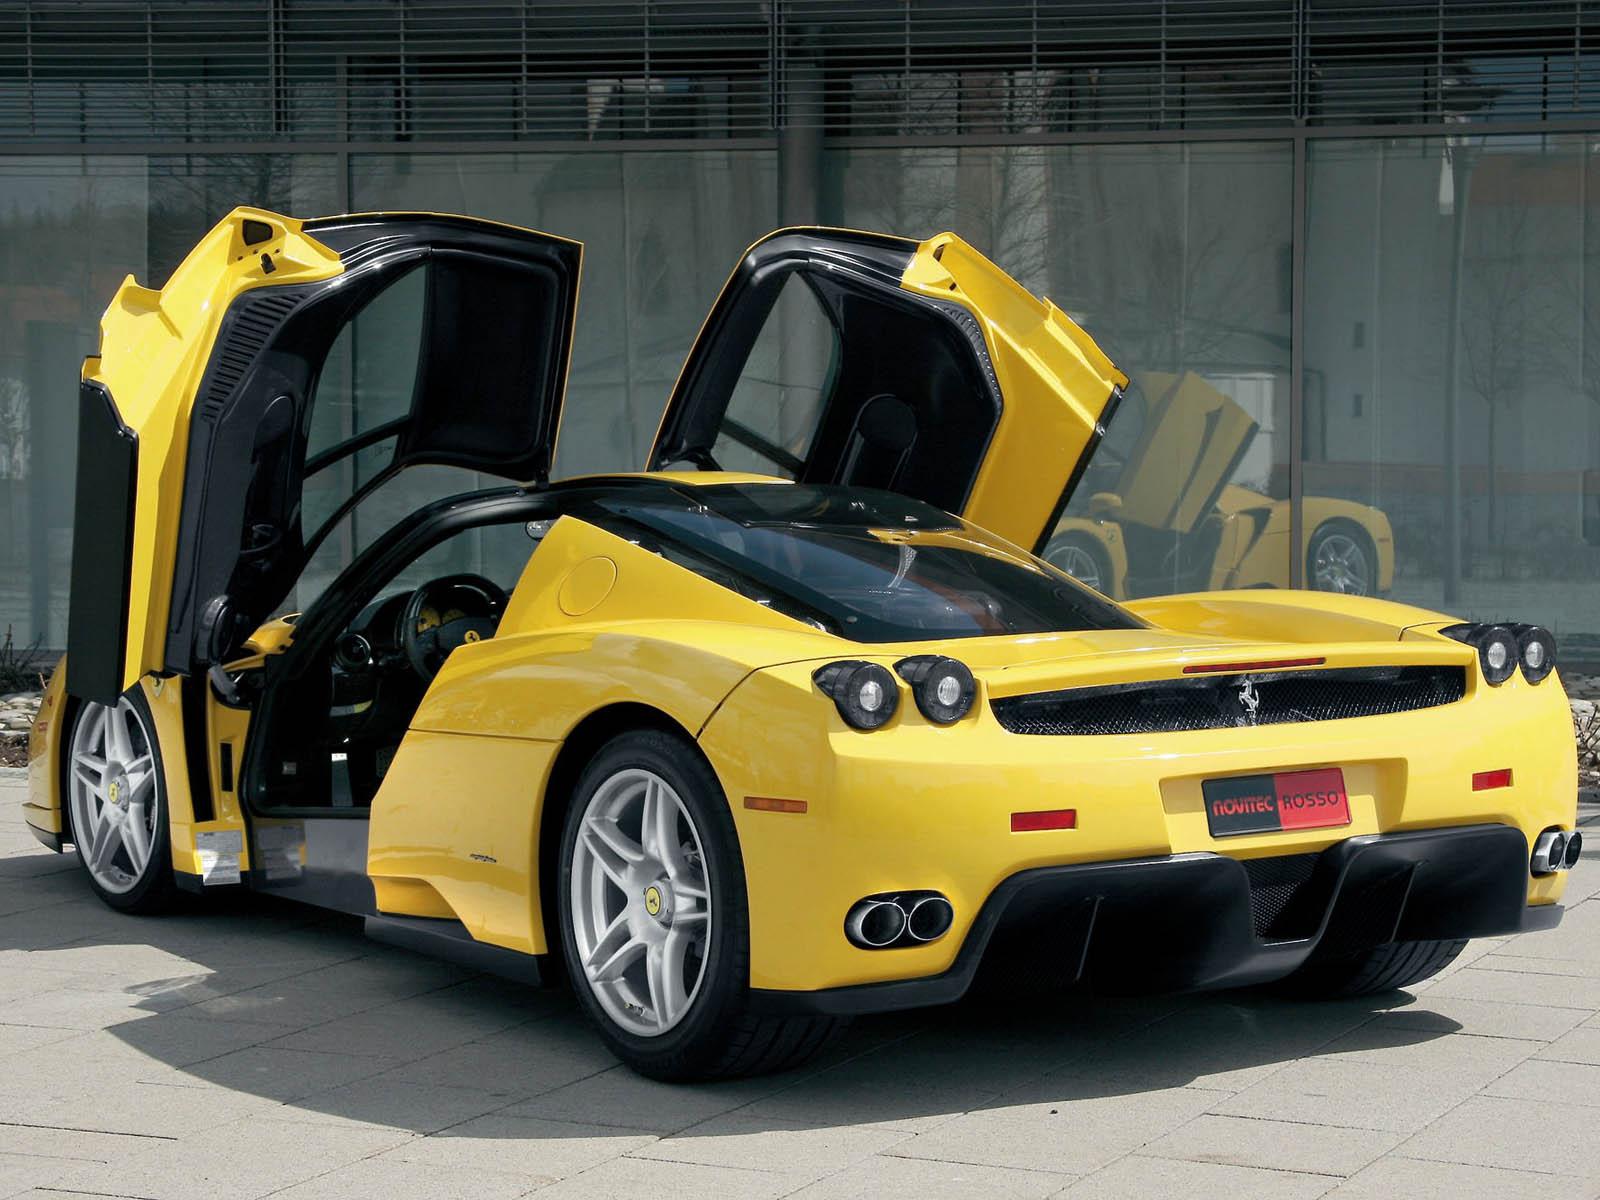 Best Car Wallpaper Enzo Ferrari Car Wallpaper Picture